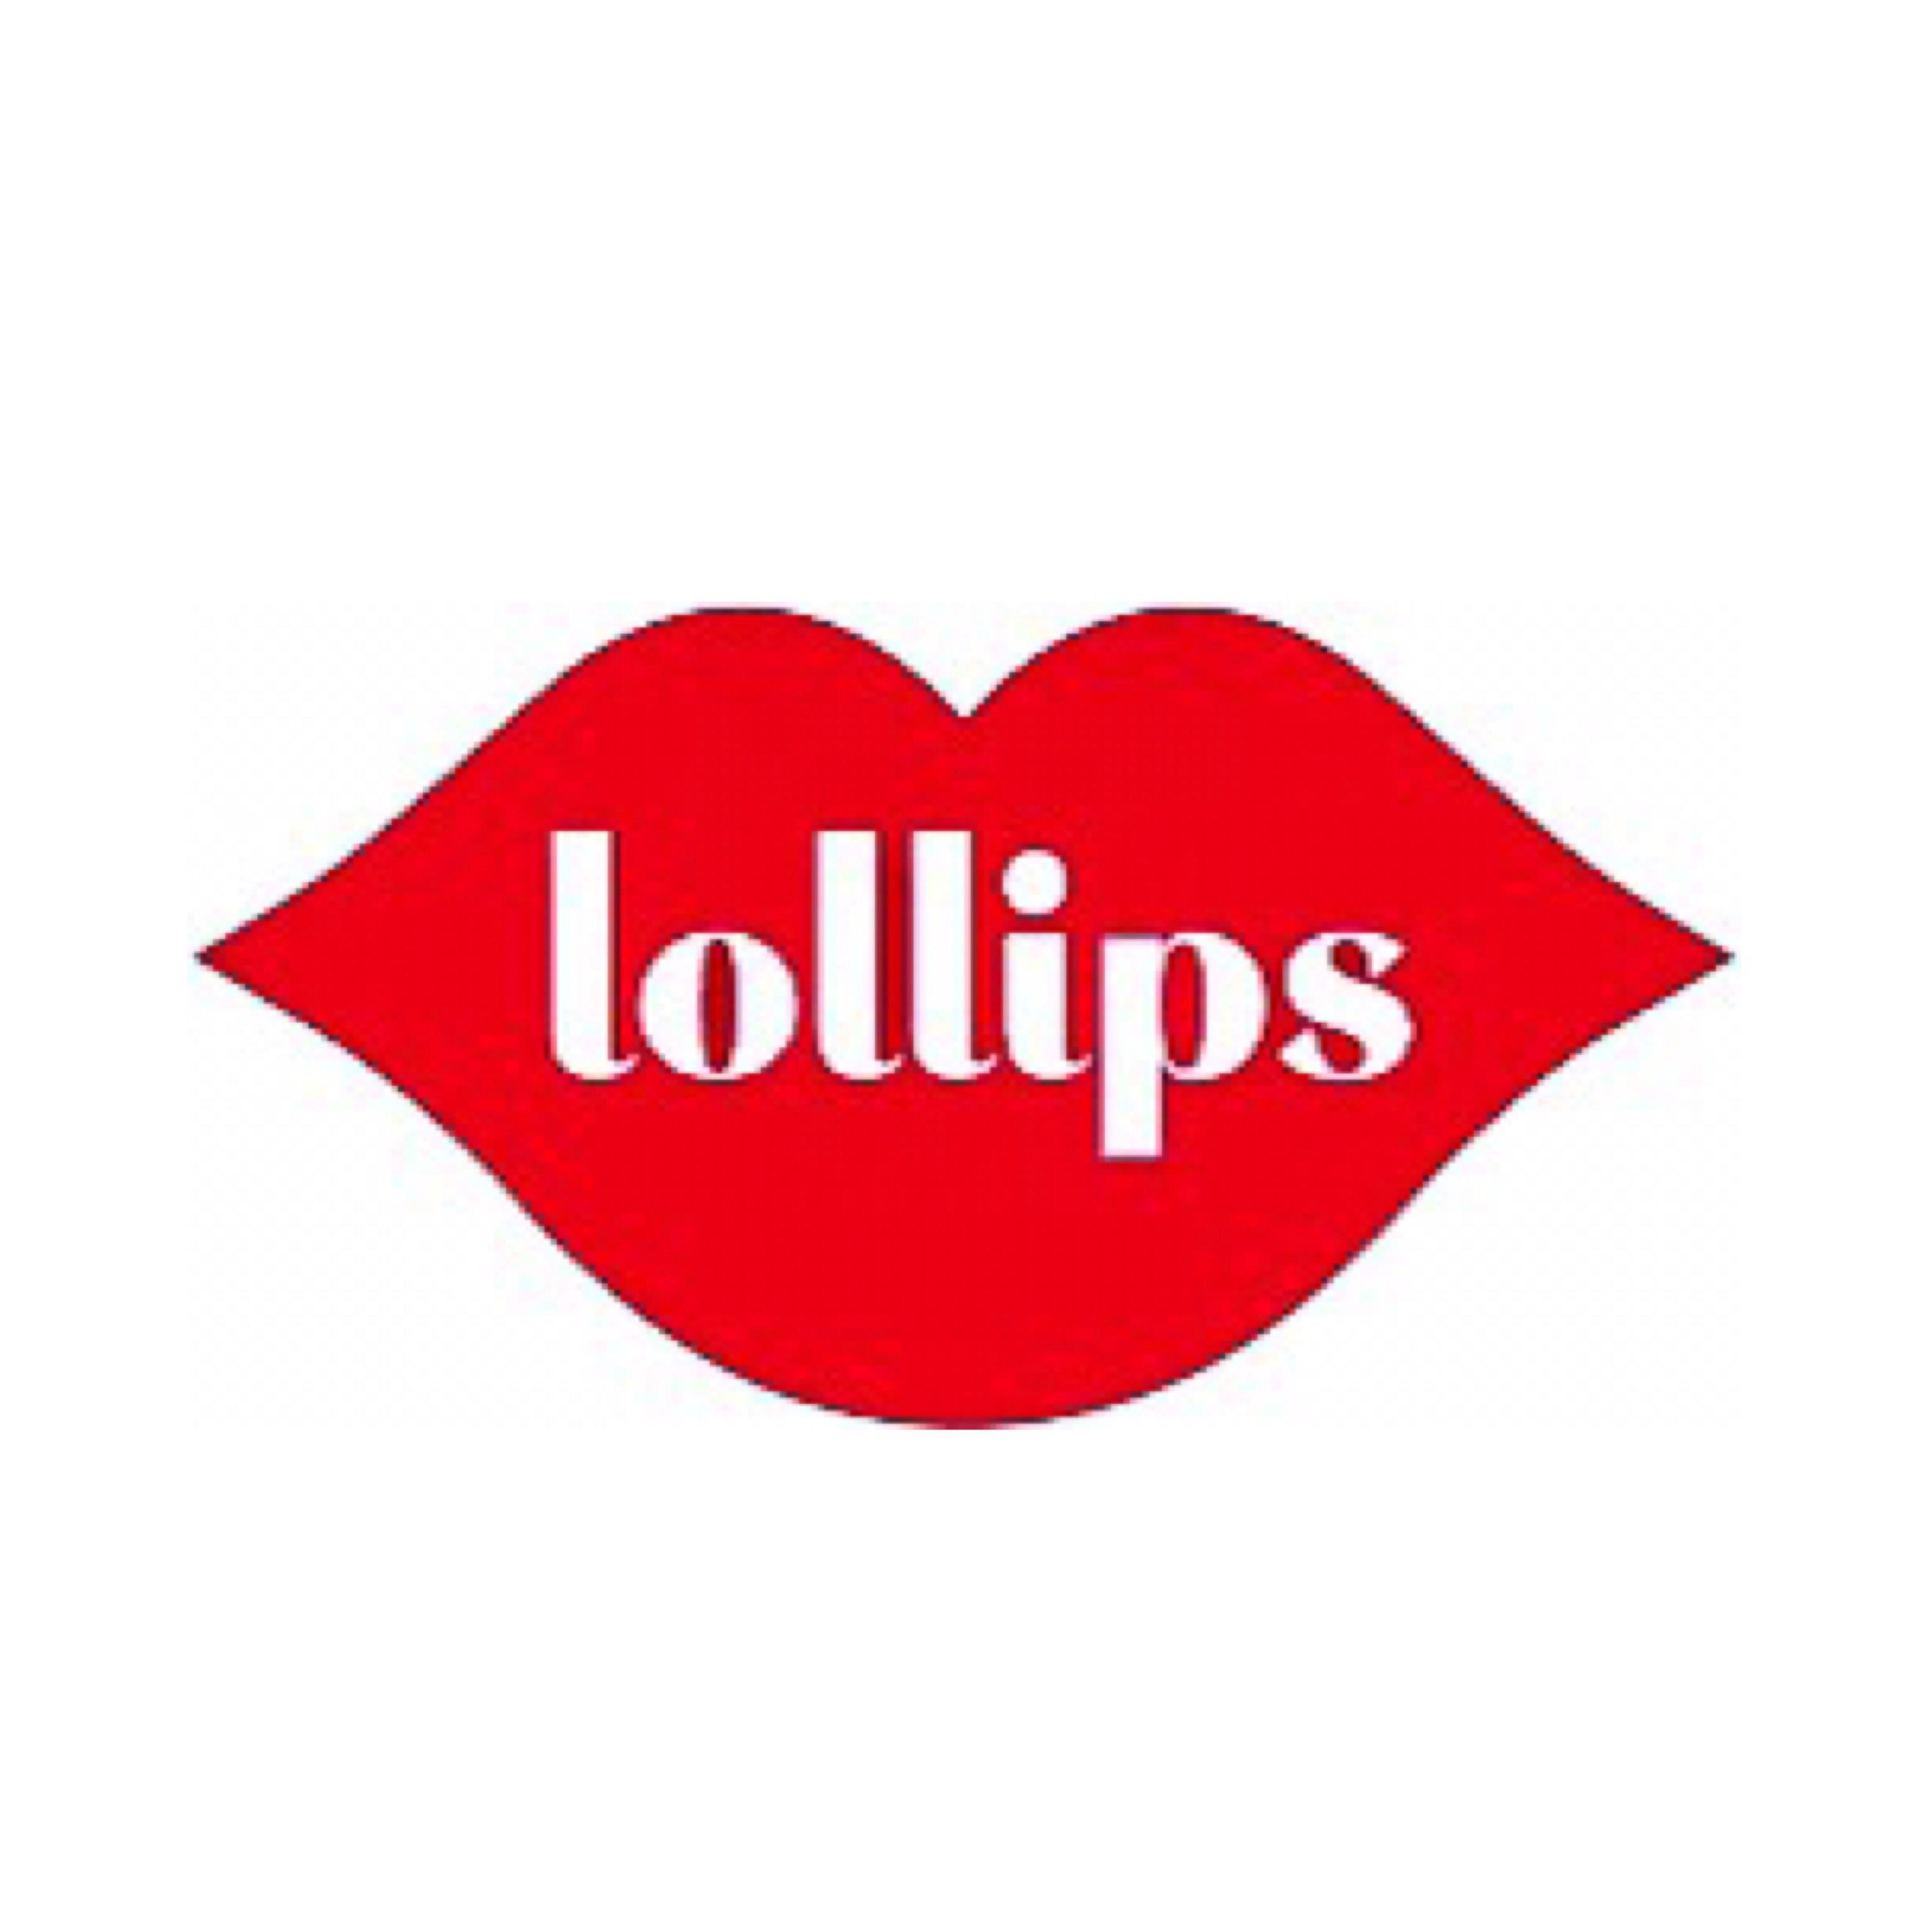 Lollips